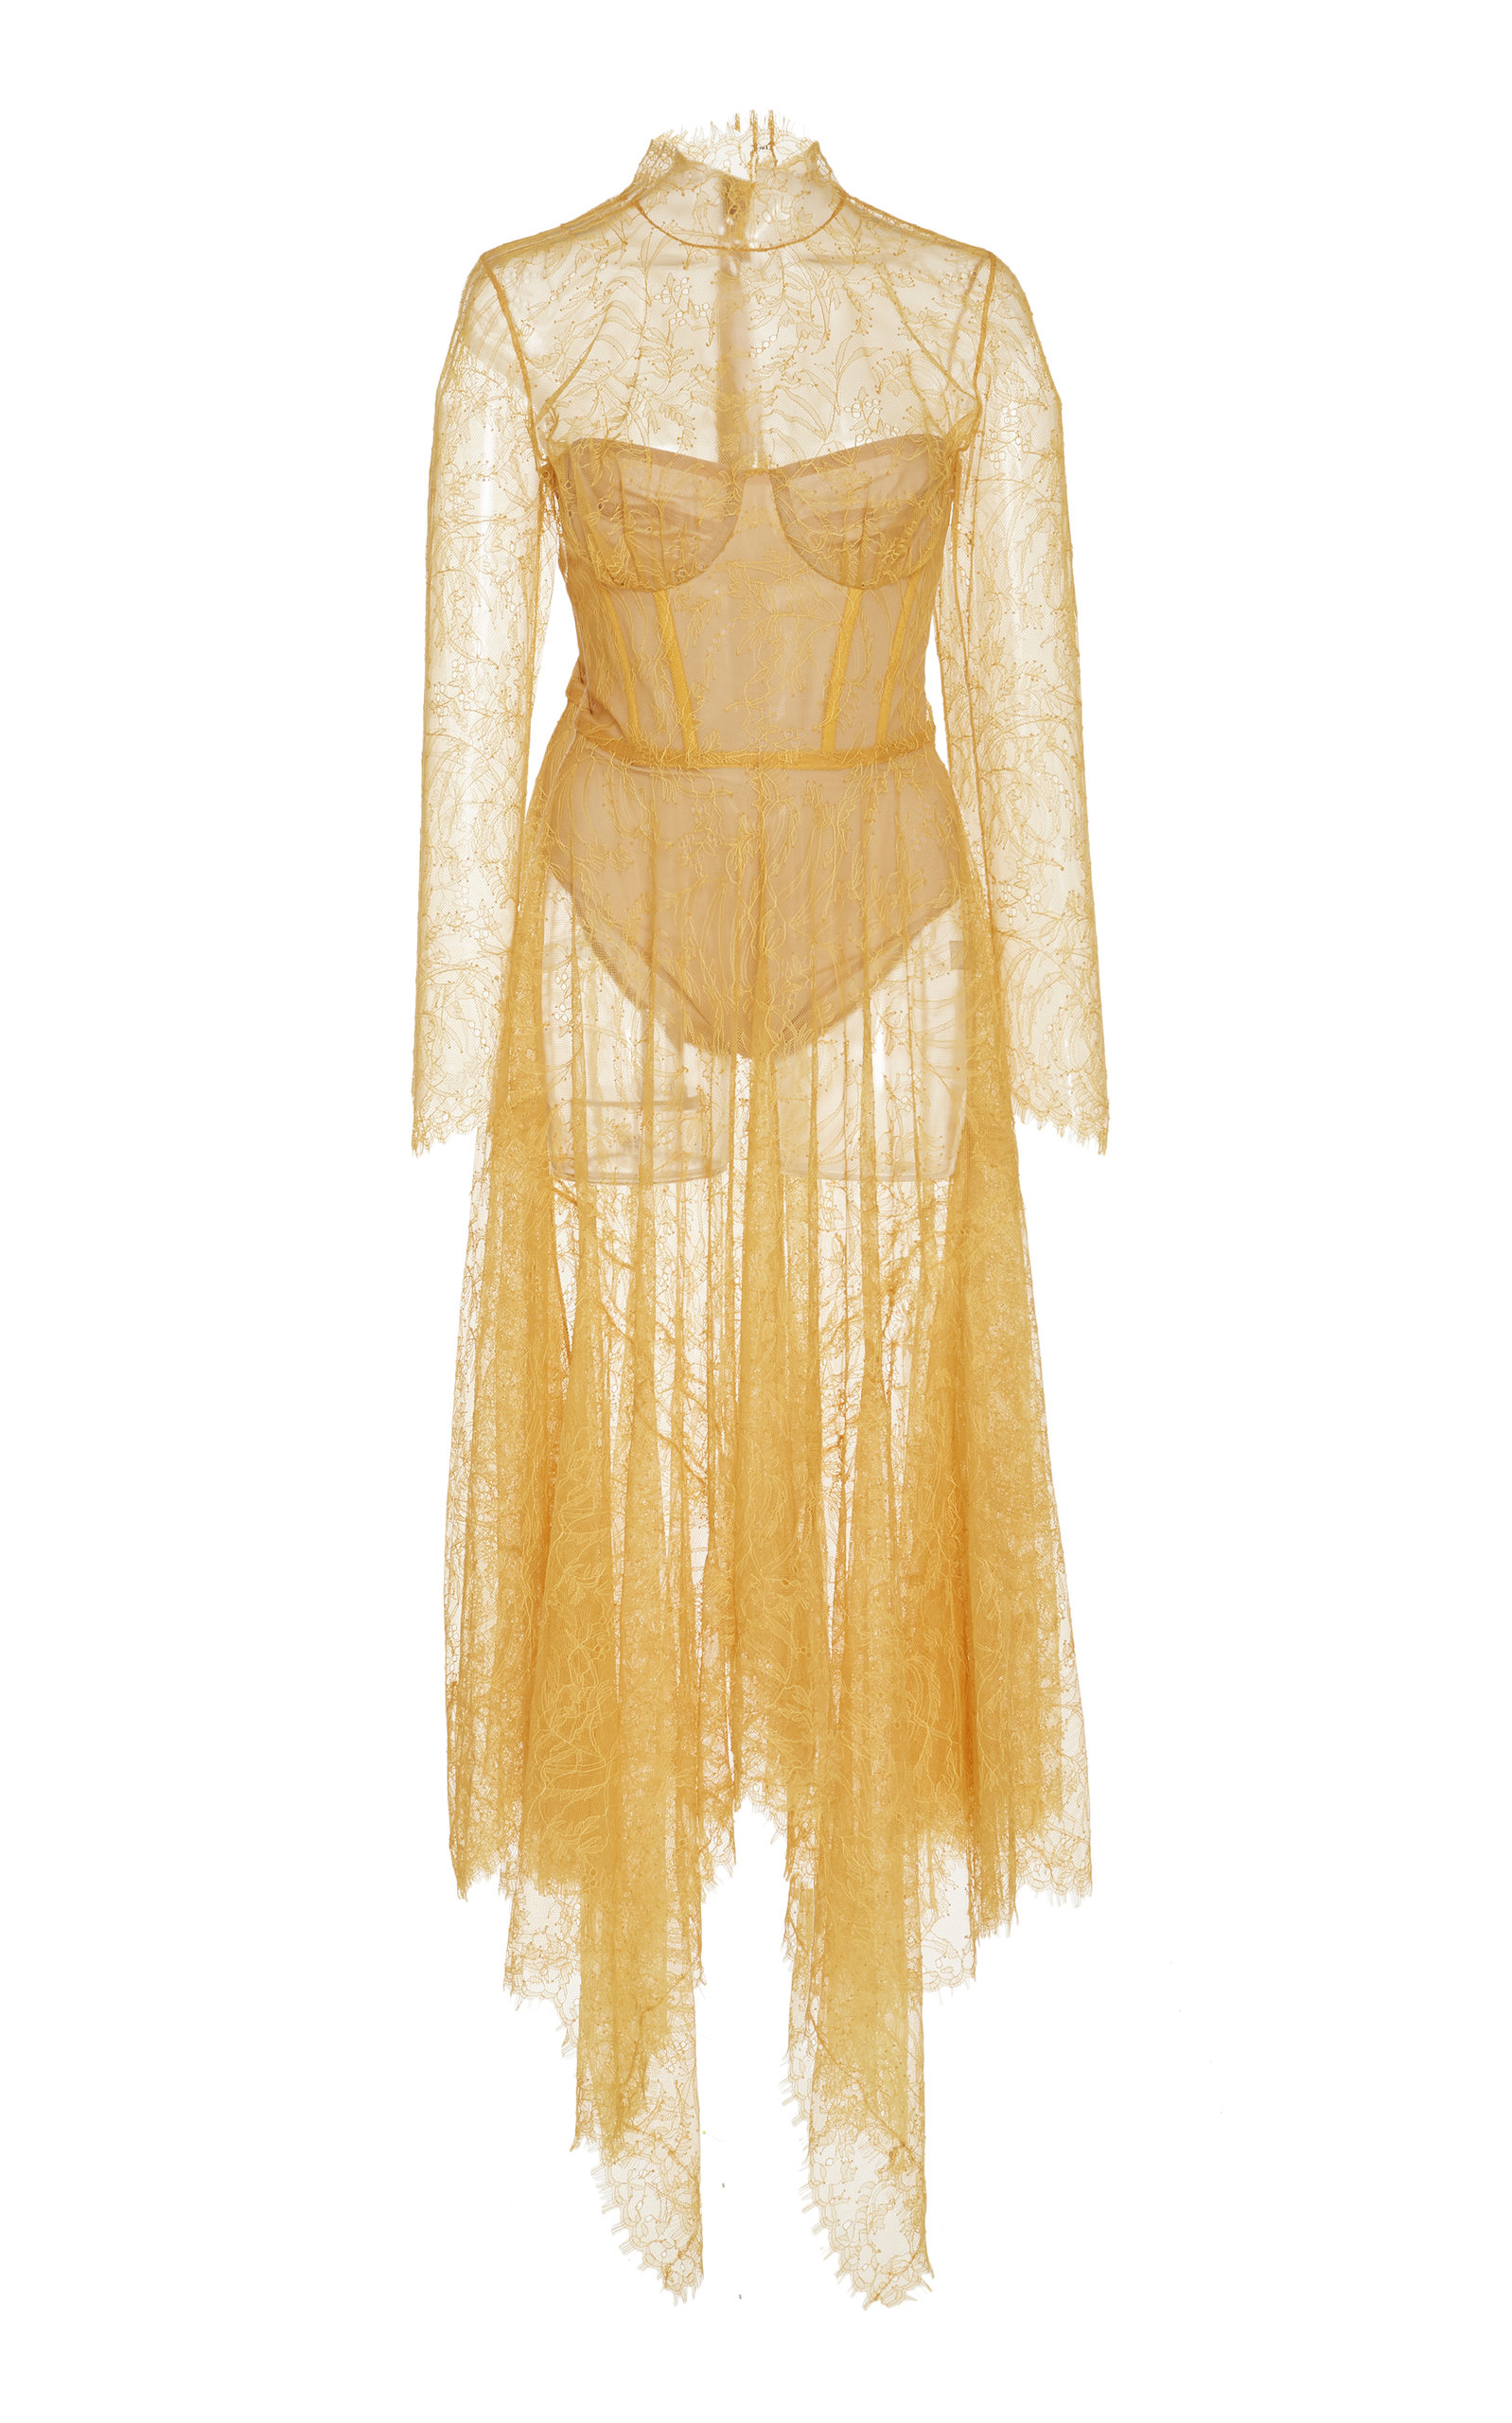 d04aef269ac1 Jonathan SimkhaiSheer Chantilly Lace Bustier Midi Dress. CLOSE. Loading